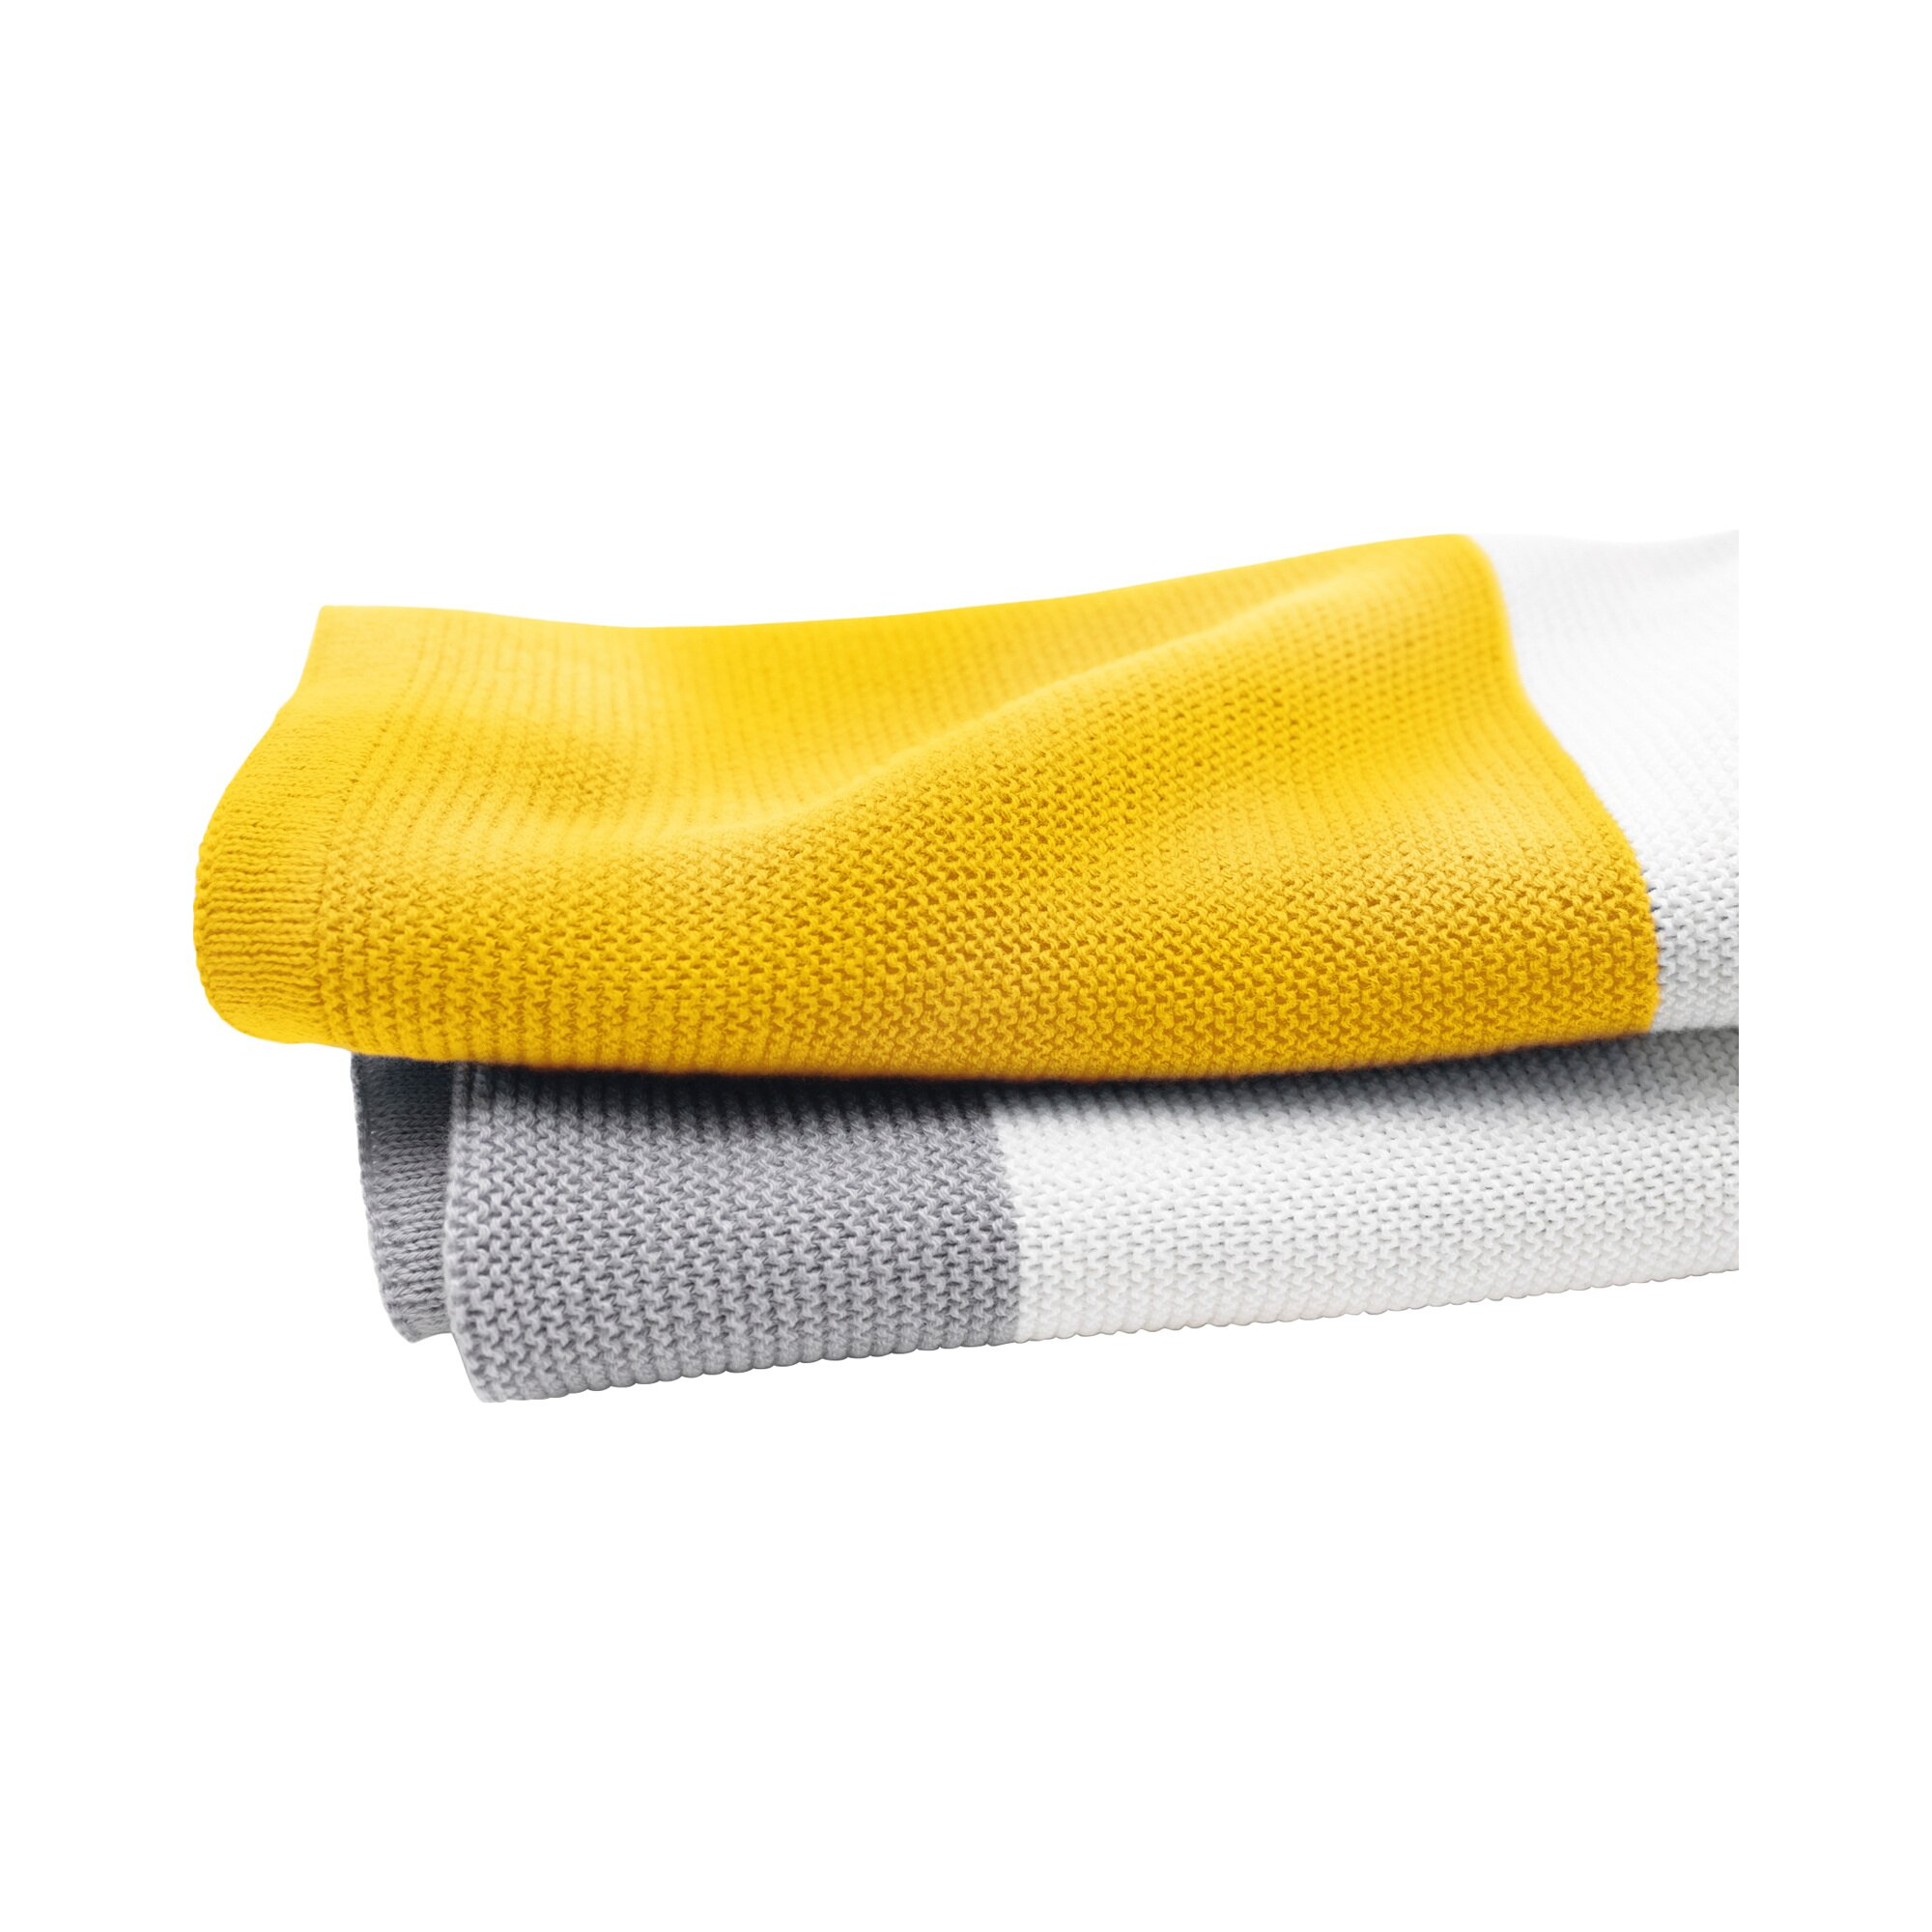 bugaboo-kinderwagendecke-80-x-100-cm-gelb